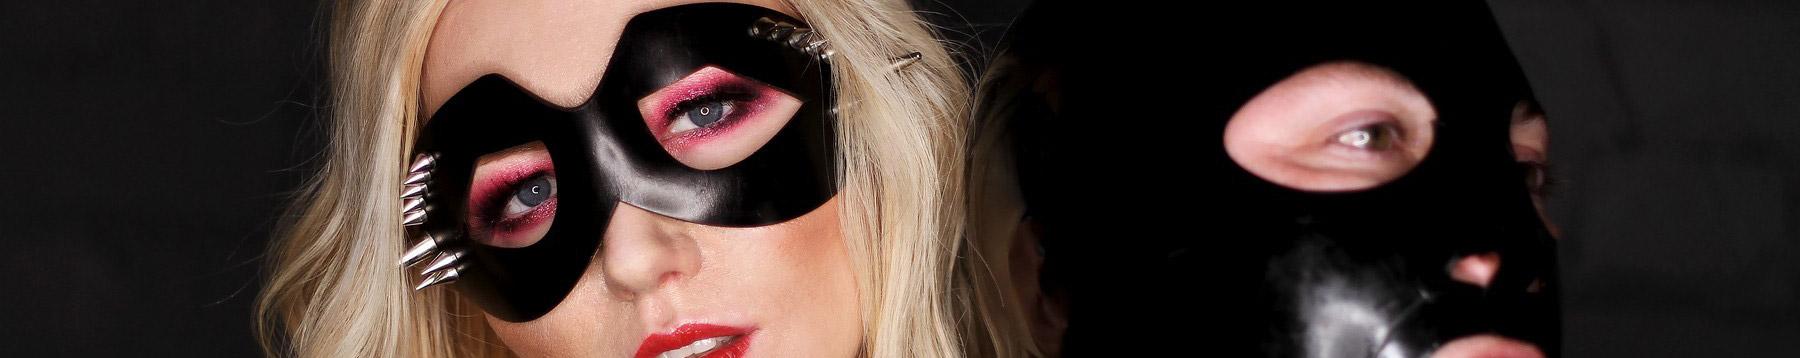 London Mistress Wildfire wearing intricate  mask